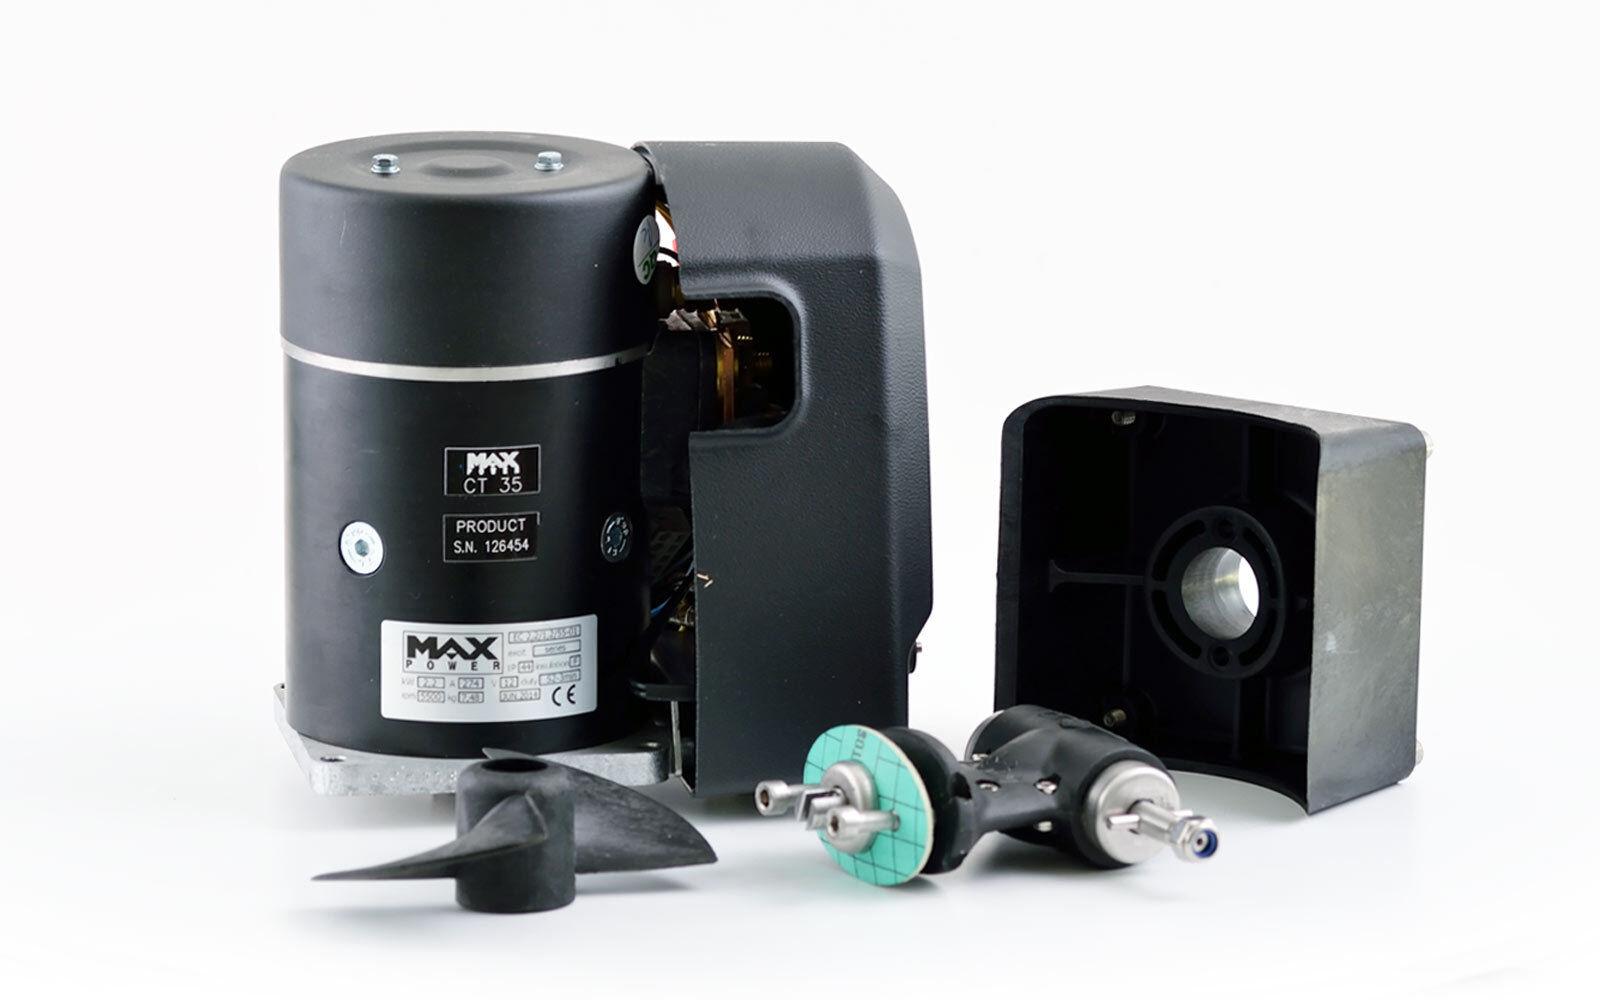 Max Power 12V Bugstrahlruder CT 35 5 3,6 PS Elektroantrieb für 5 35 - 10 m MotorStiefel b3d6b8